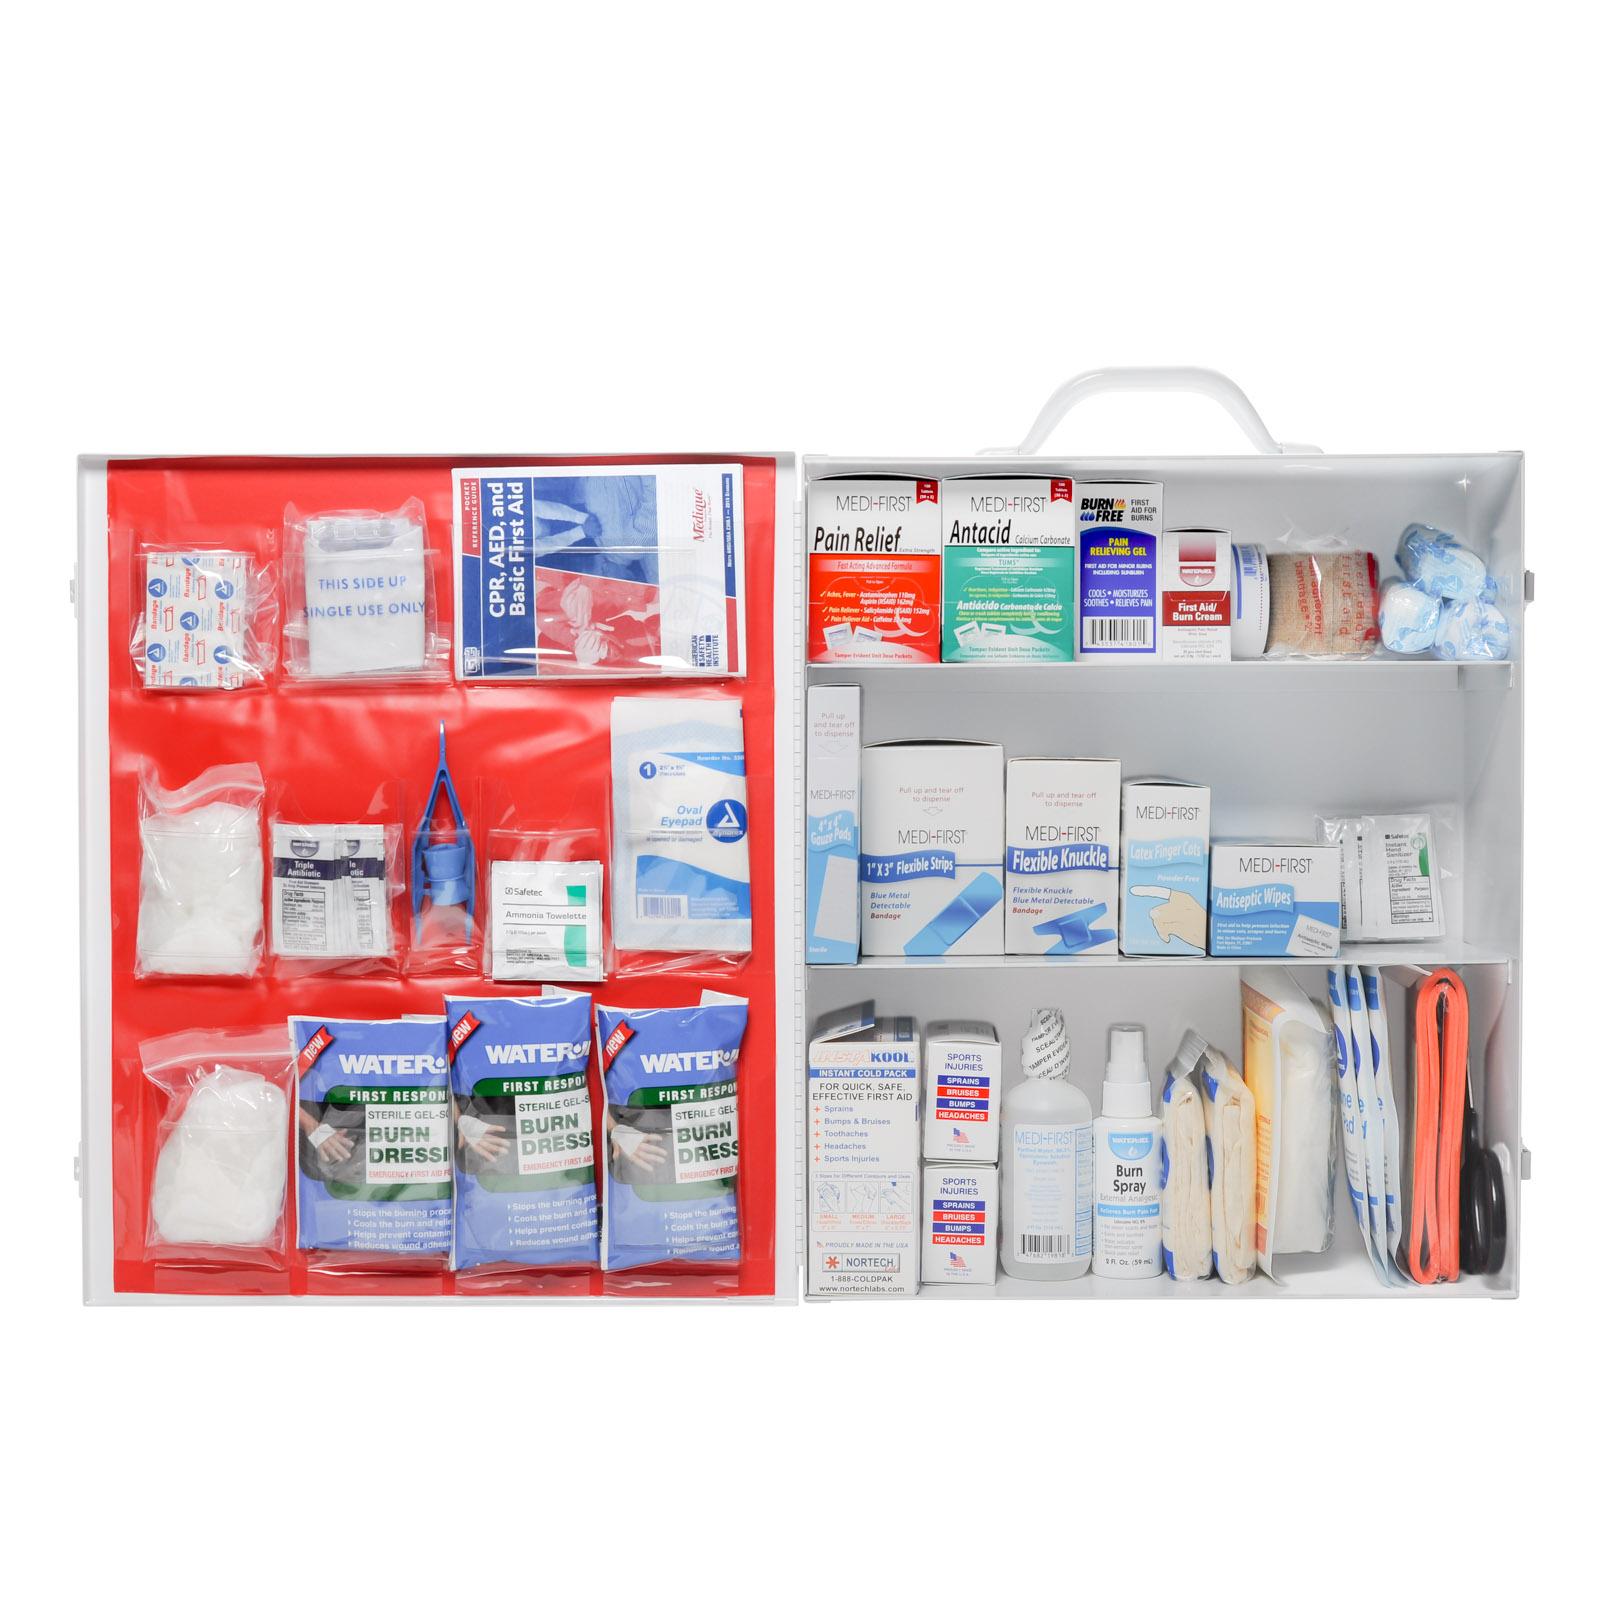 Restaurant first aid kit 3 shelf complete mfasco health for First aid kits for restaurant kitchens